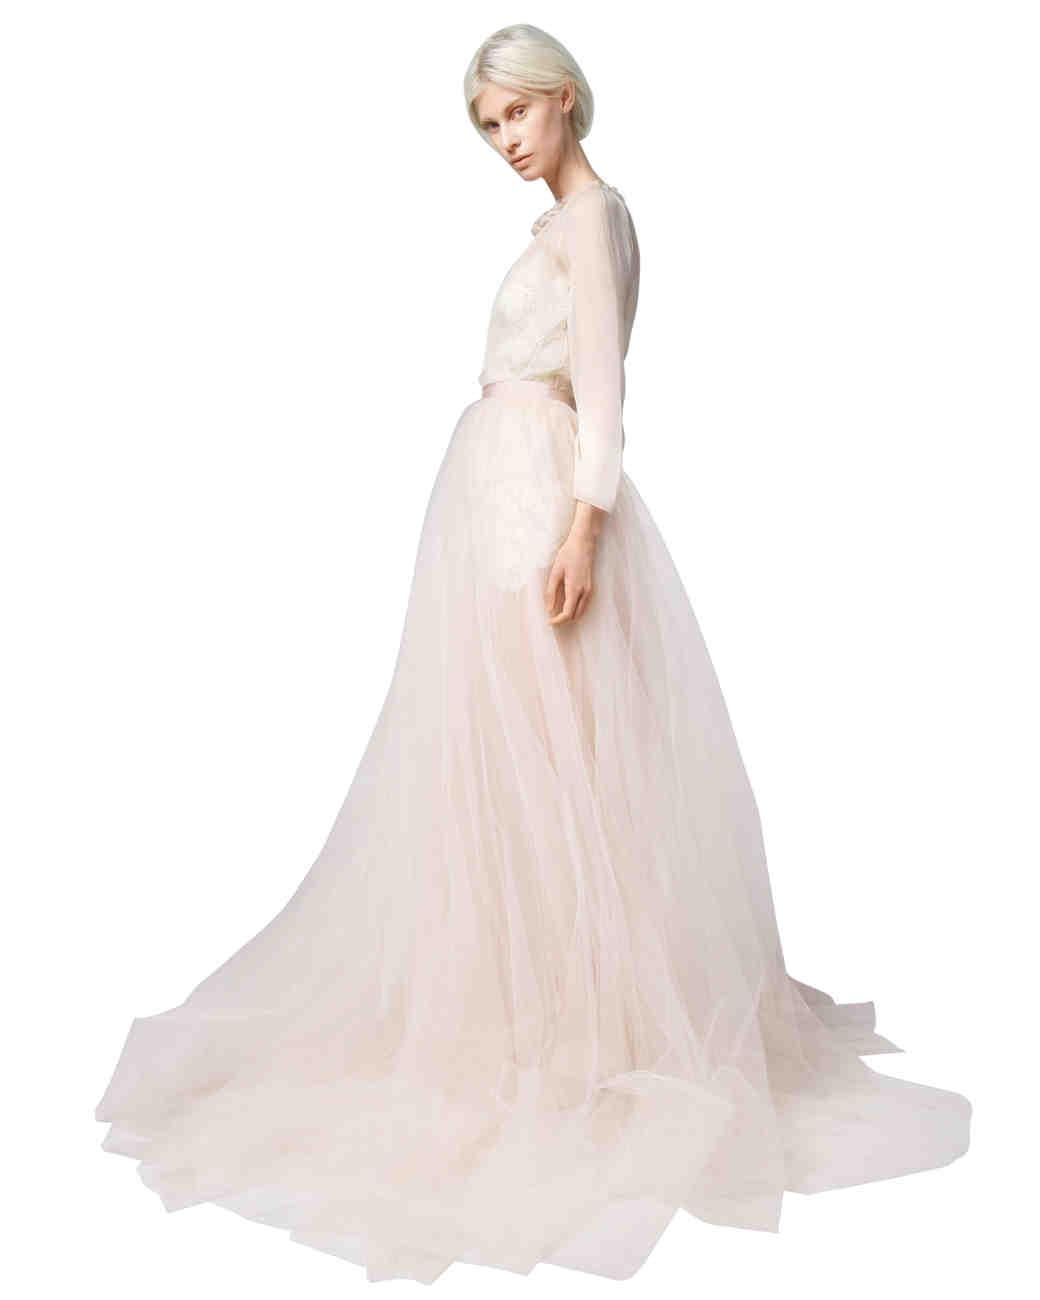 samuelle-couture-1-s111866.jpg